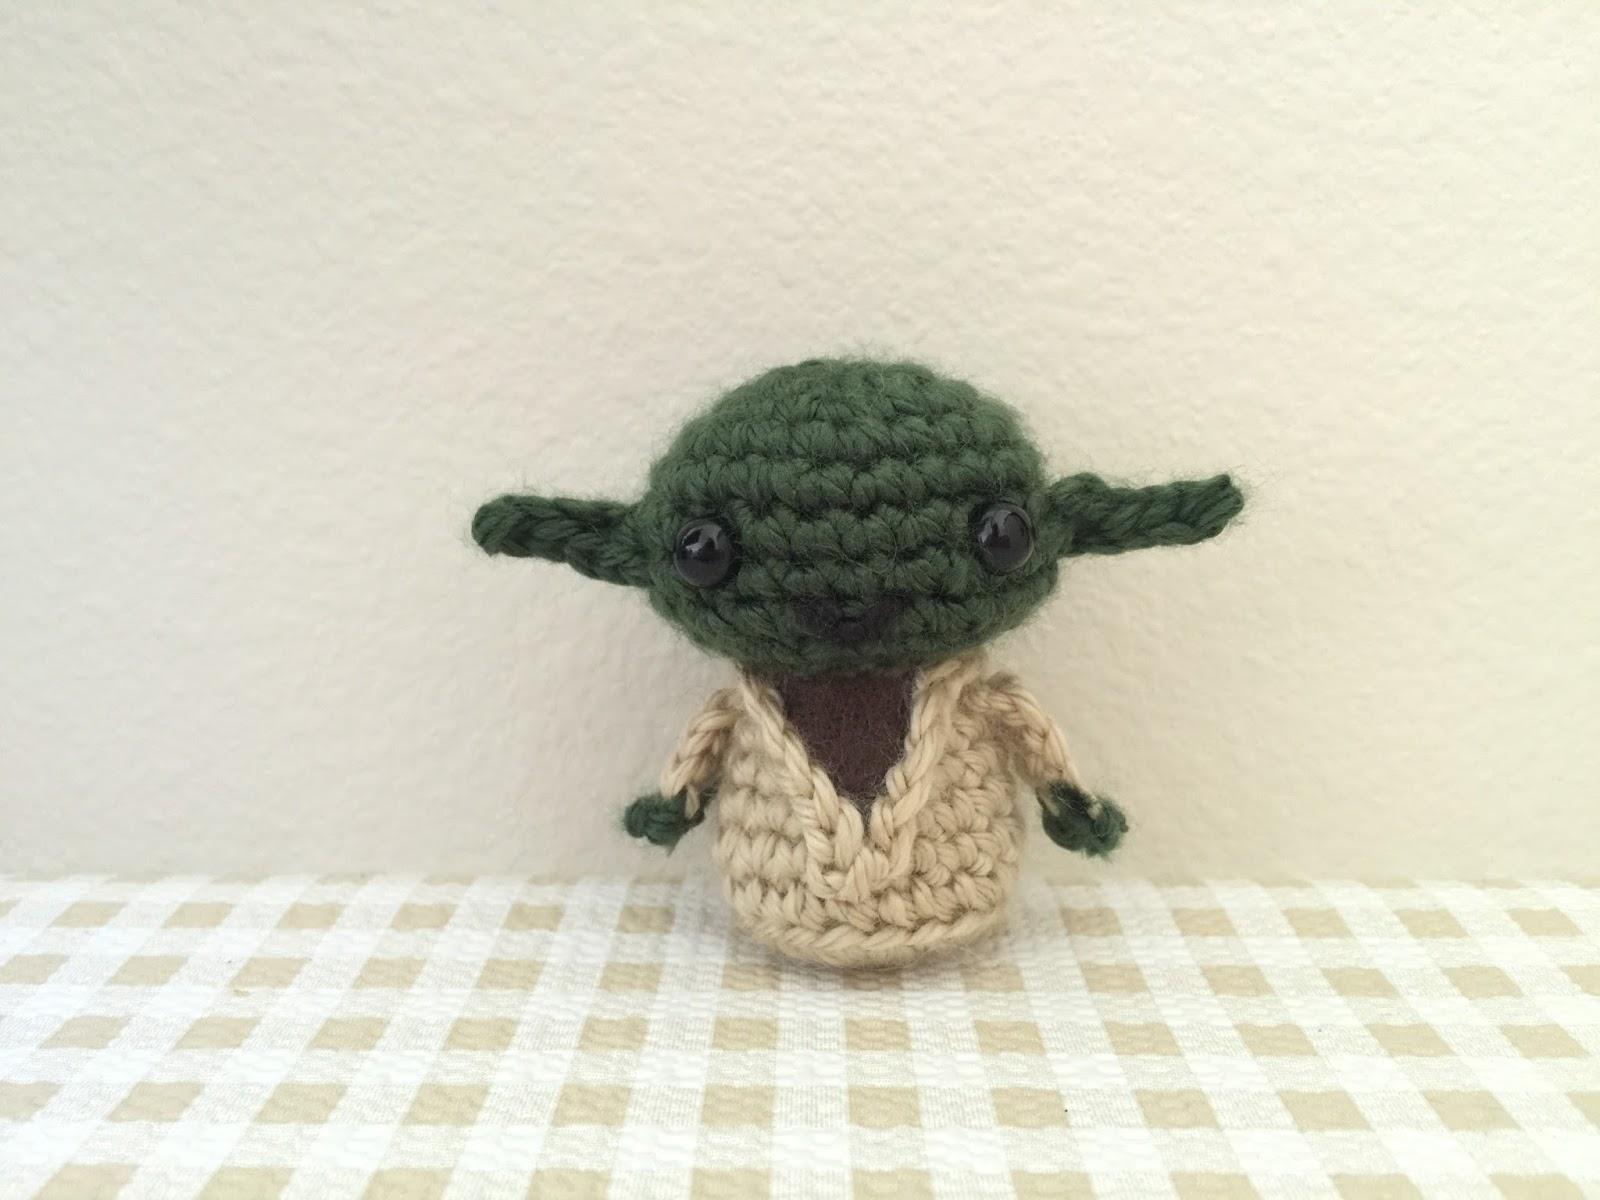 Crochet Green Baby Yoda Amigurumi Free Pattern - #Amigurumi; Star ... | 1200x1600